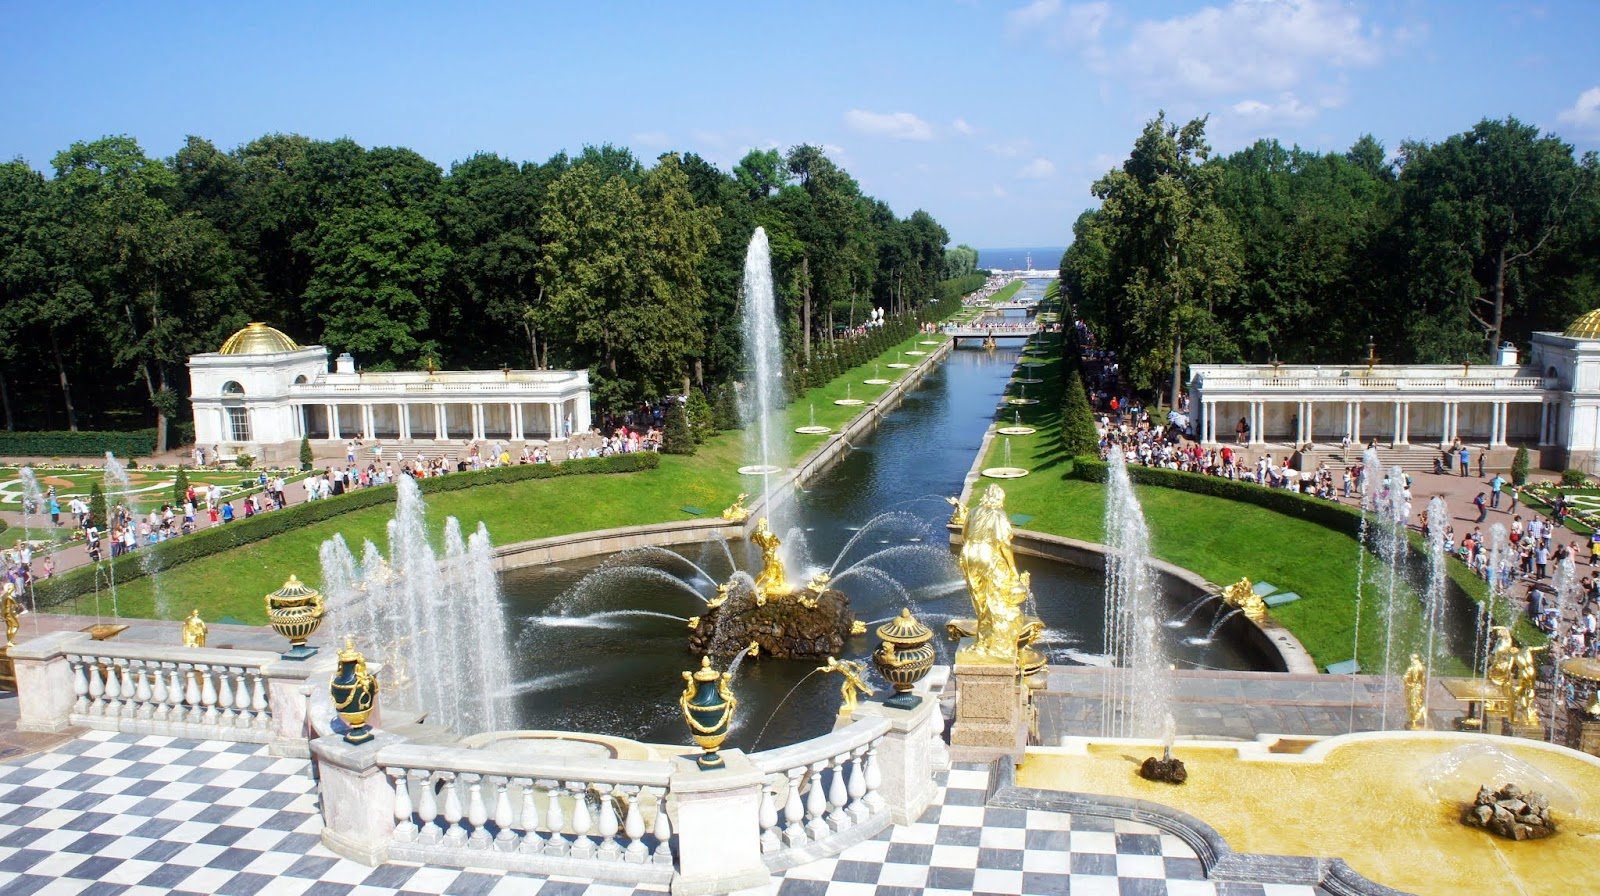 Cindy喵之異言堂: [出差][旅遊] 聖彼得堡 - 必去 彼得夏宮 Peterhof - 下花園 (2013)